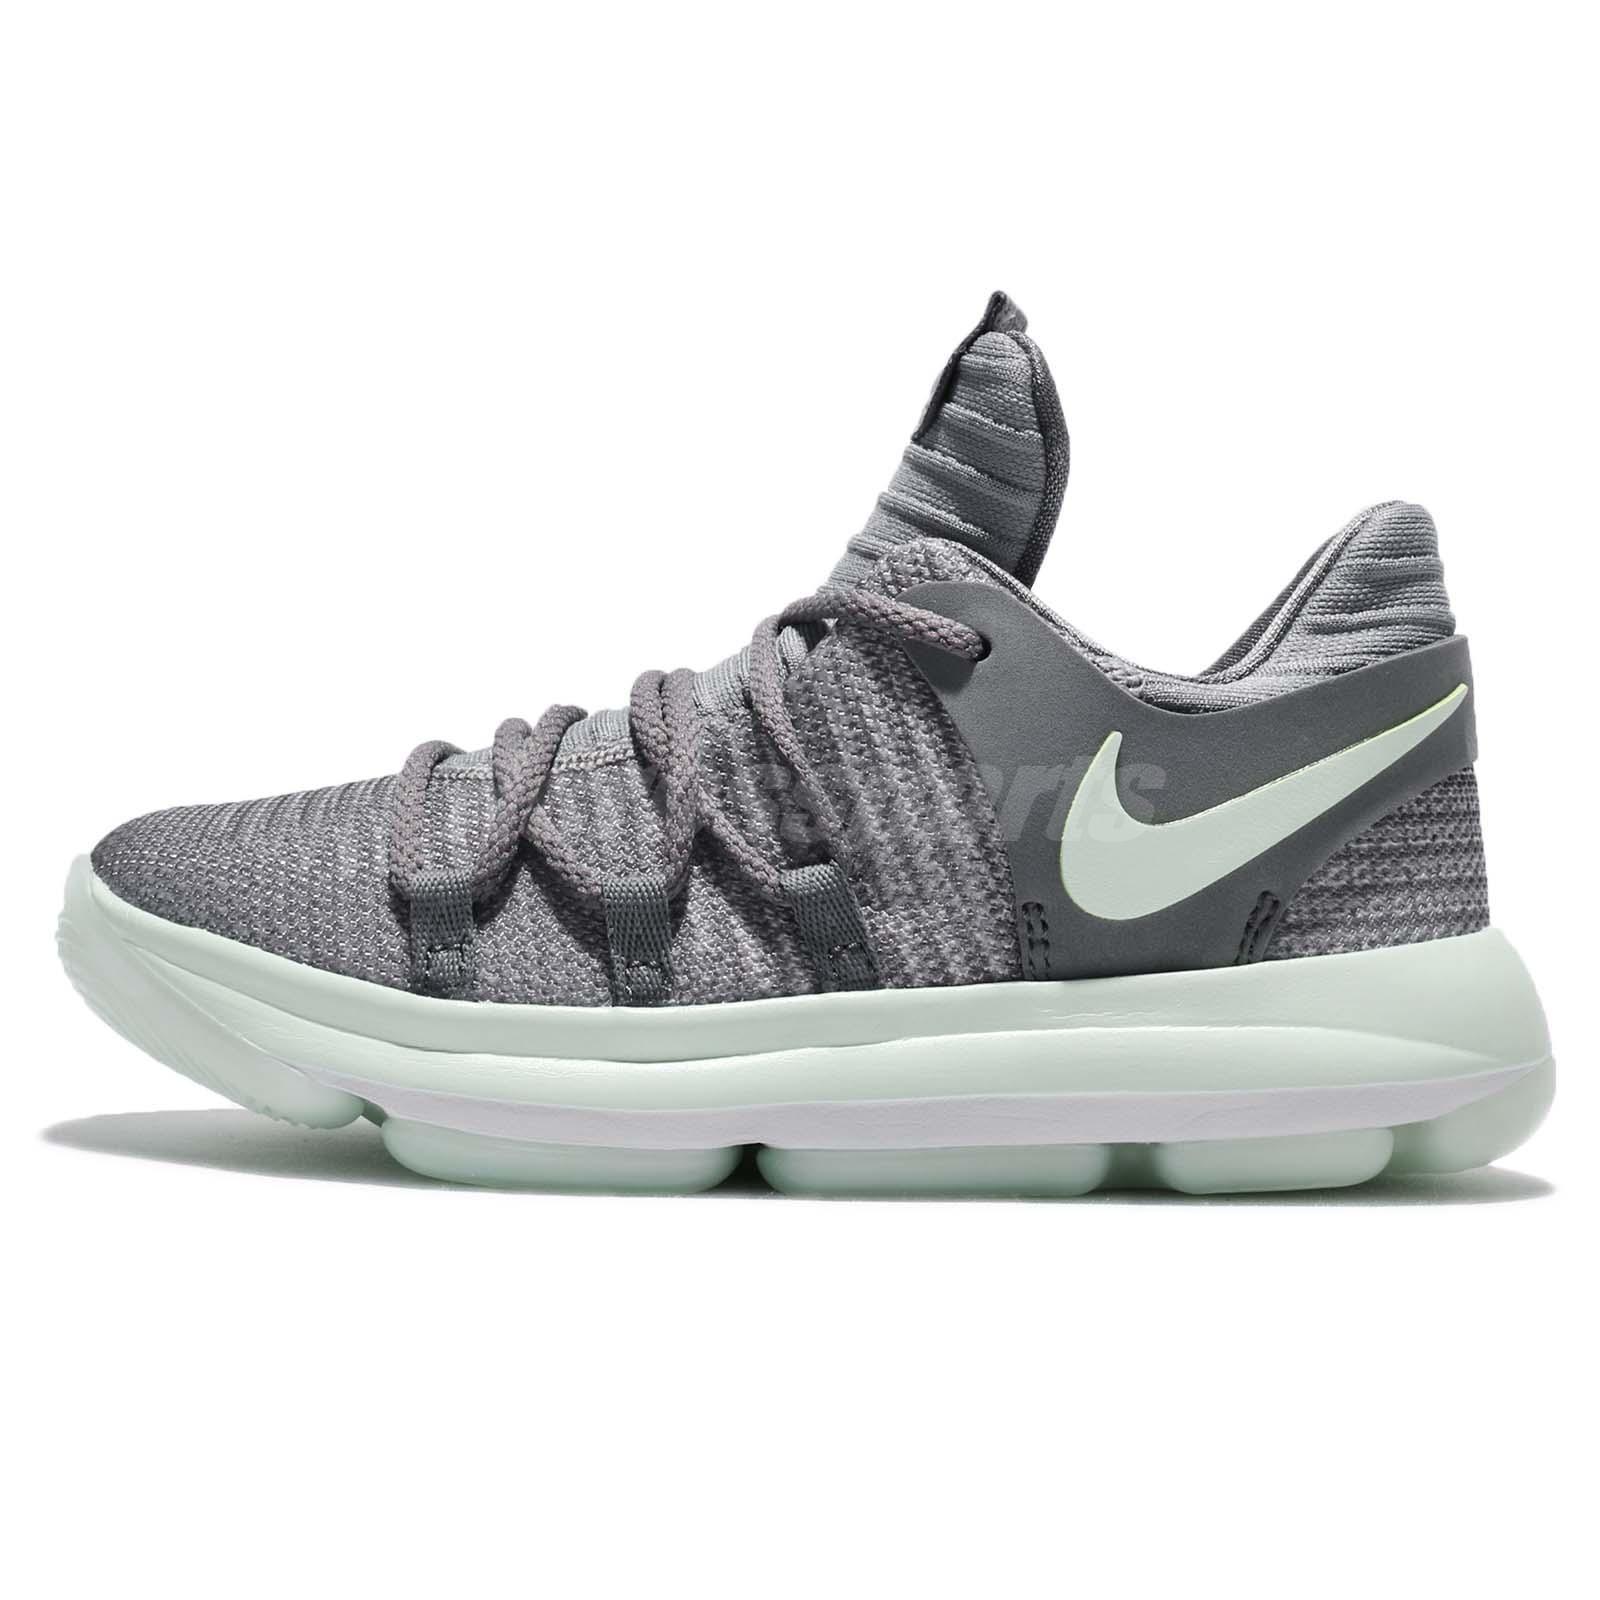 hot sale online 57699 f8eec Nike KD10 PS KDX Durant Cool Grey Igloo Preschool Boys Basketball 918364-002